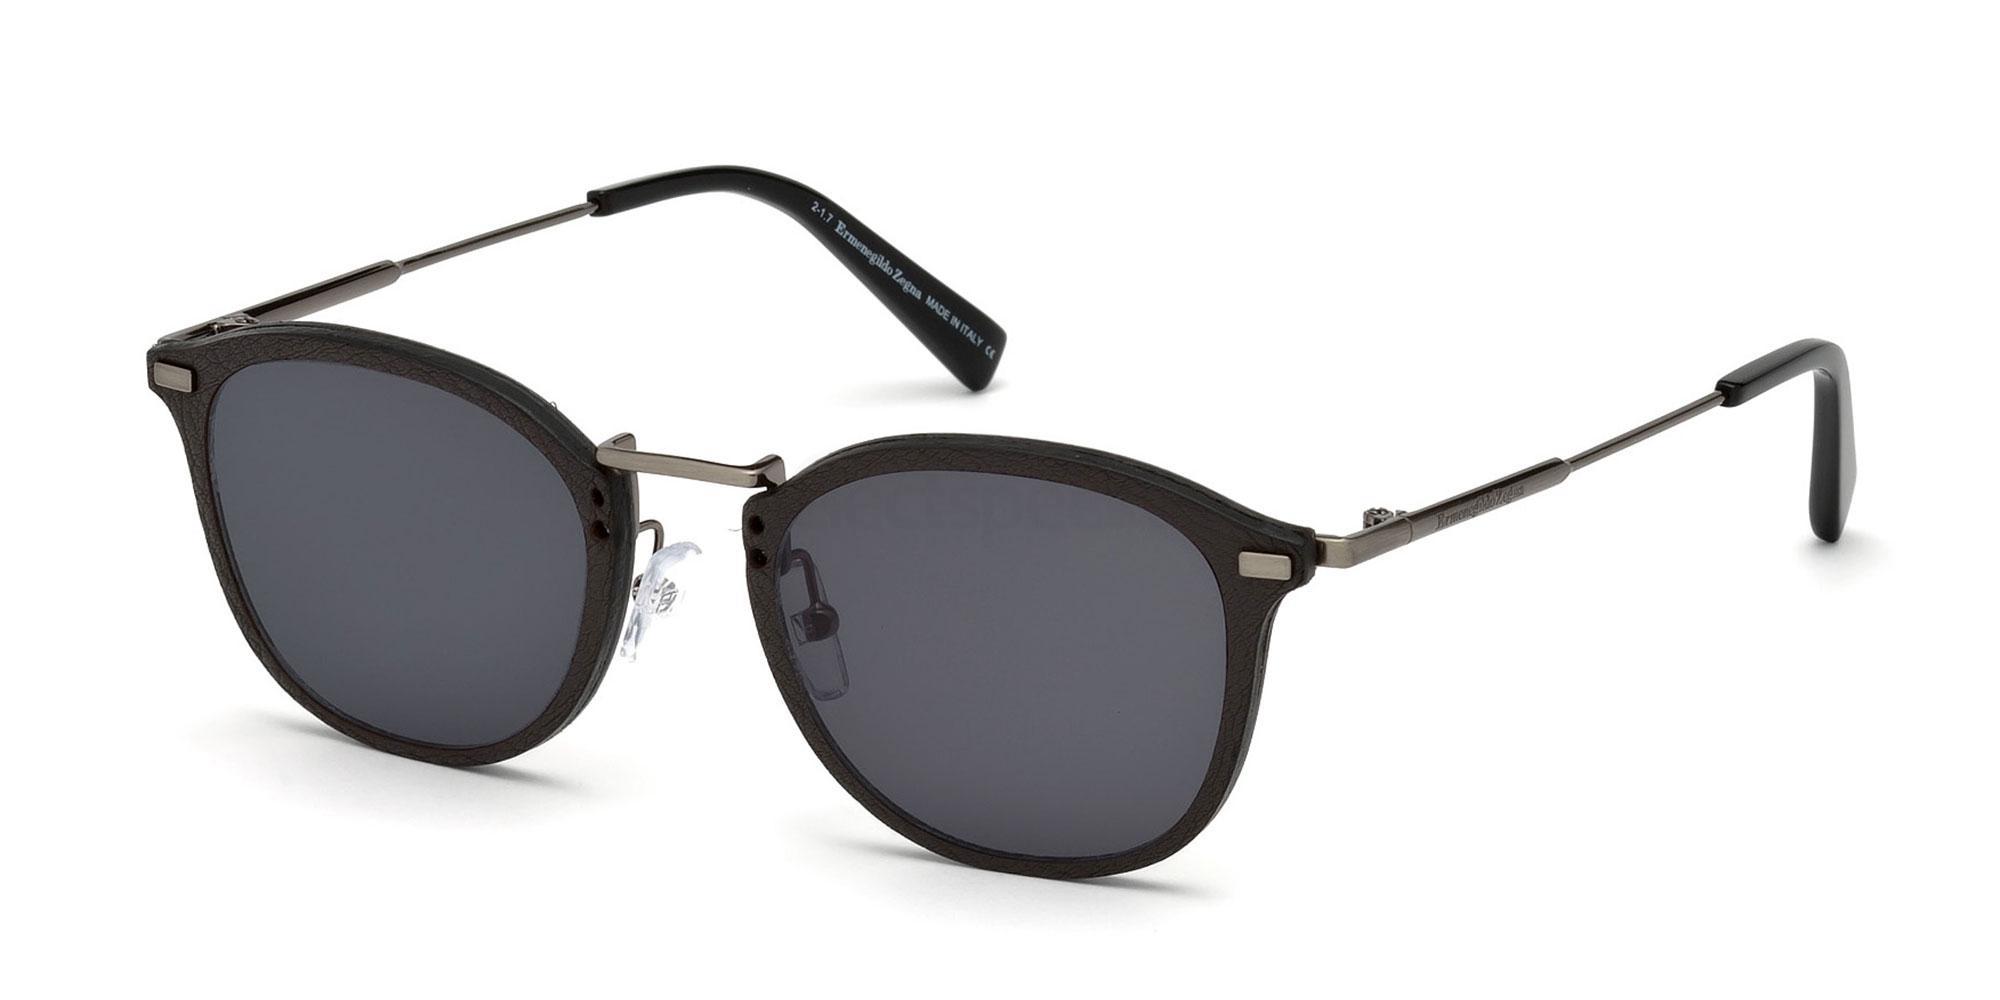 08A EZ0097 Sunglasses, Ermenegildo Zegna